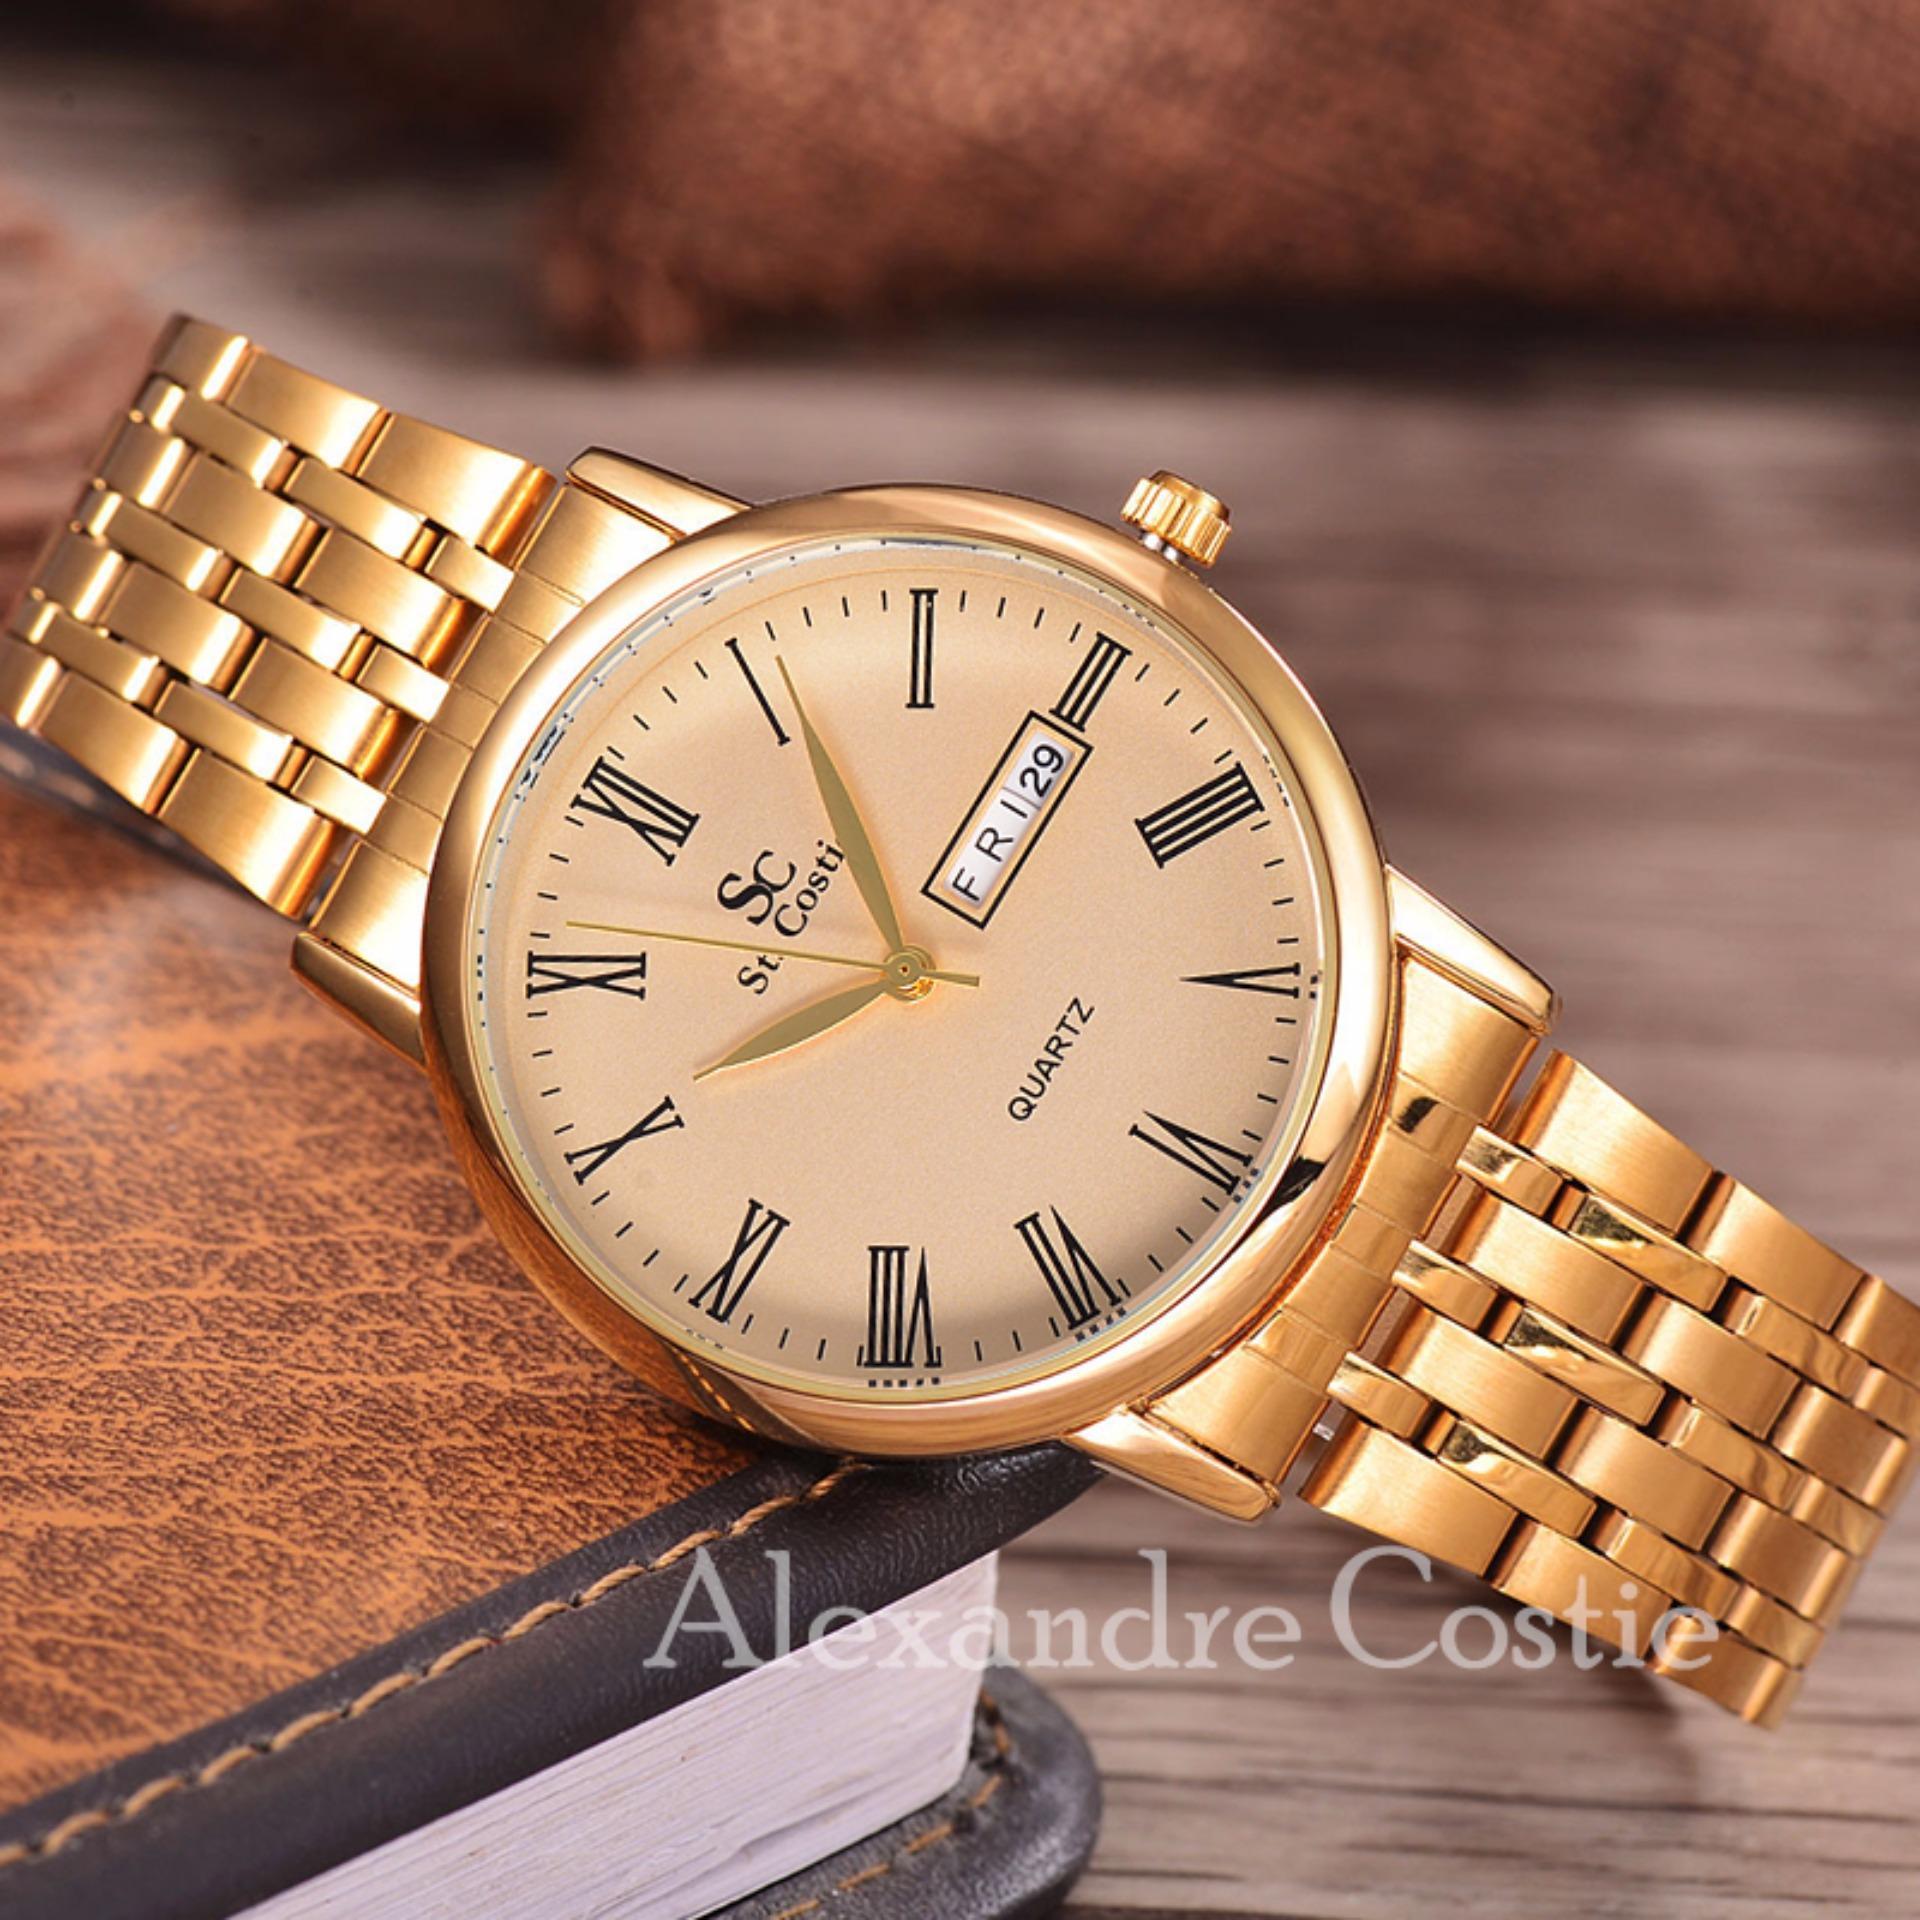 ... Saint Costie Original Brand, Jam Tangan Wanita - Body Gold - Gold Dial - Stainless ...